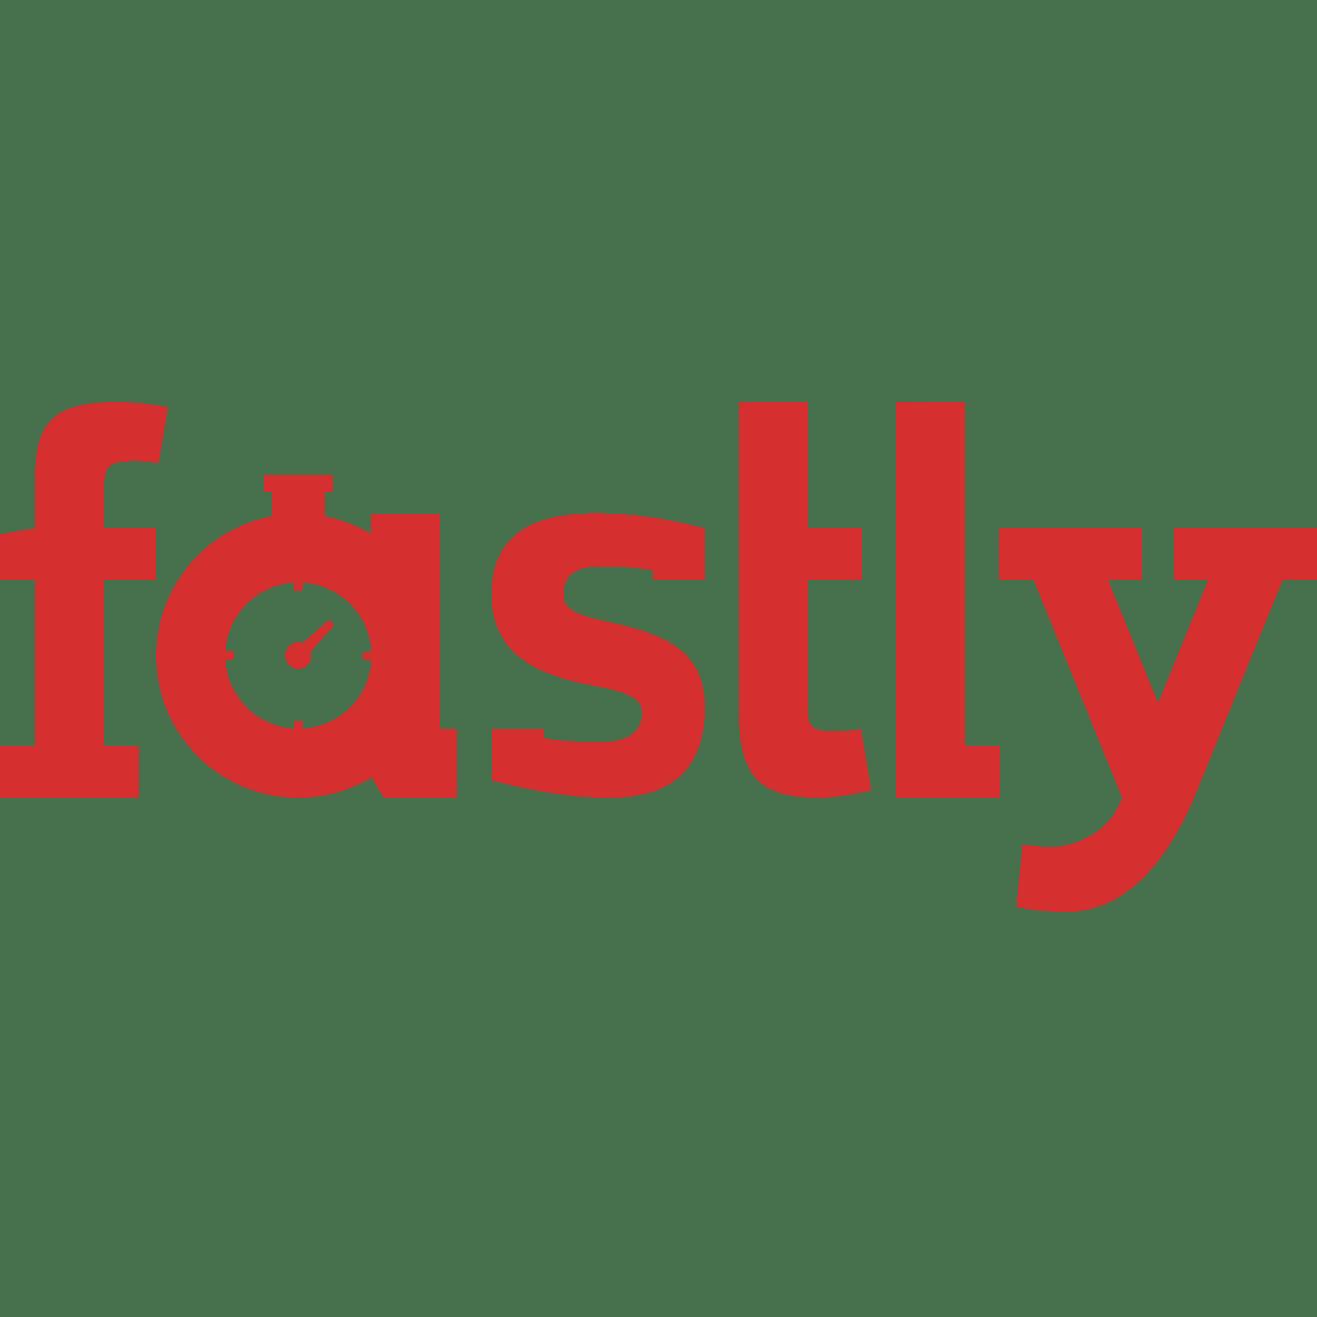 Fastly | Fundamentale Aktienanalyse